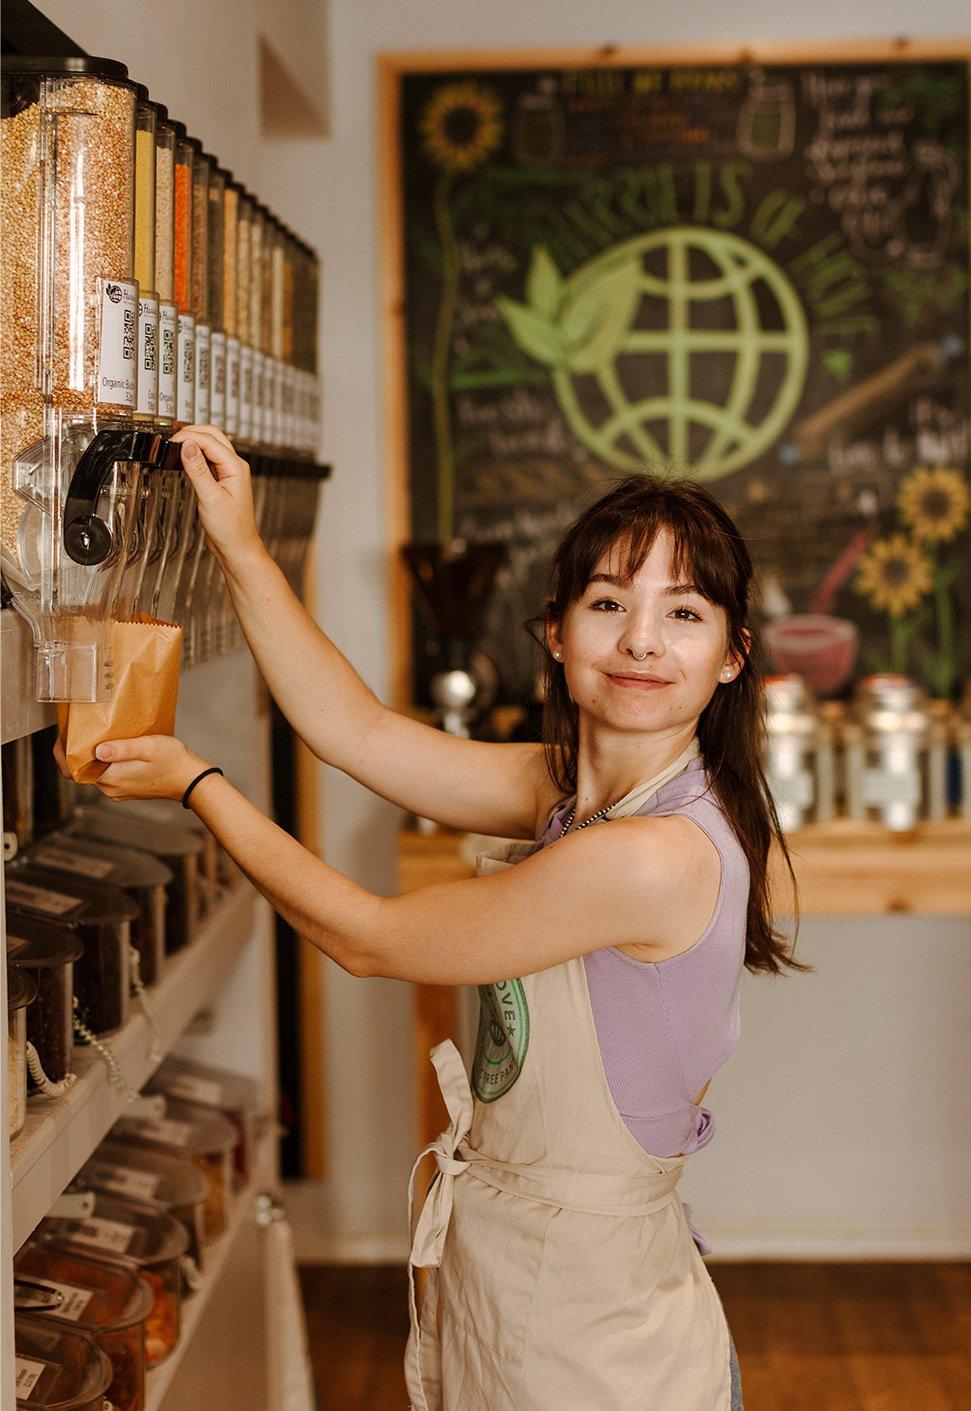 shop assistant refill store